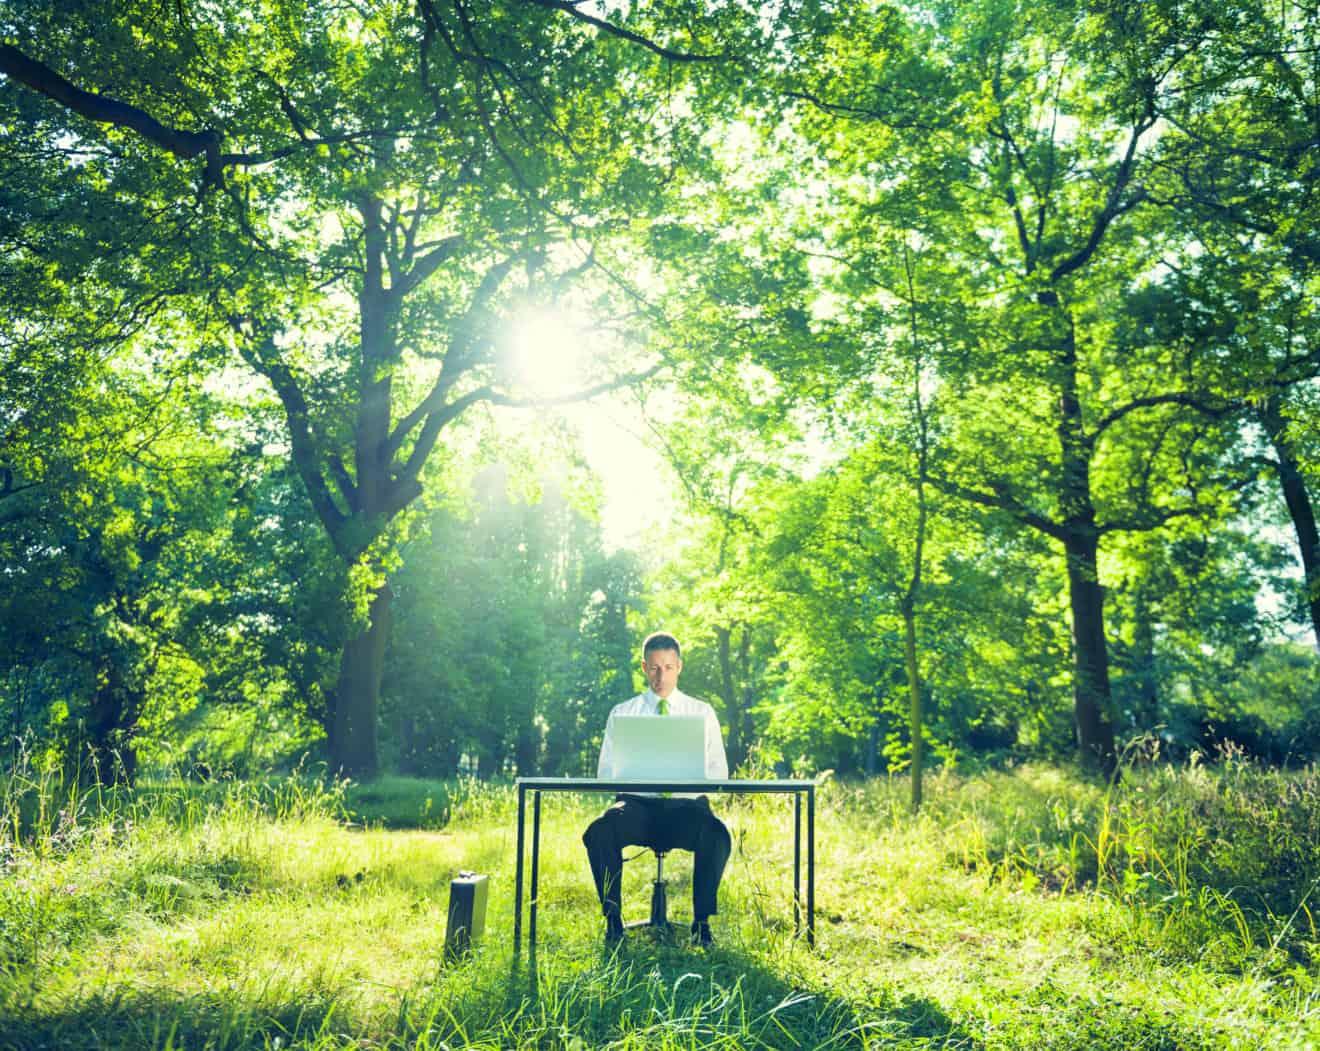 Environmental Conscious Businessman in Nature